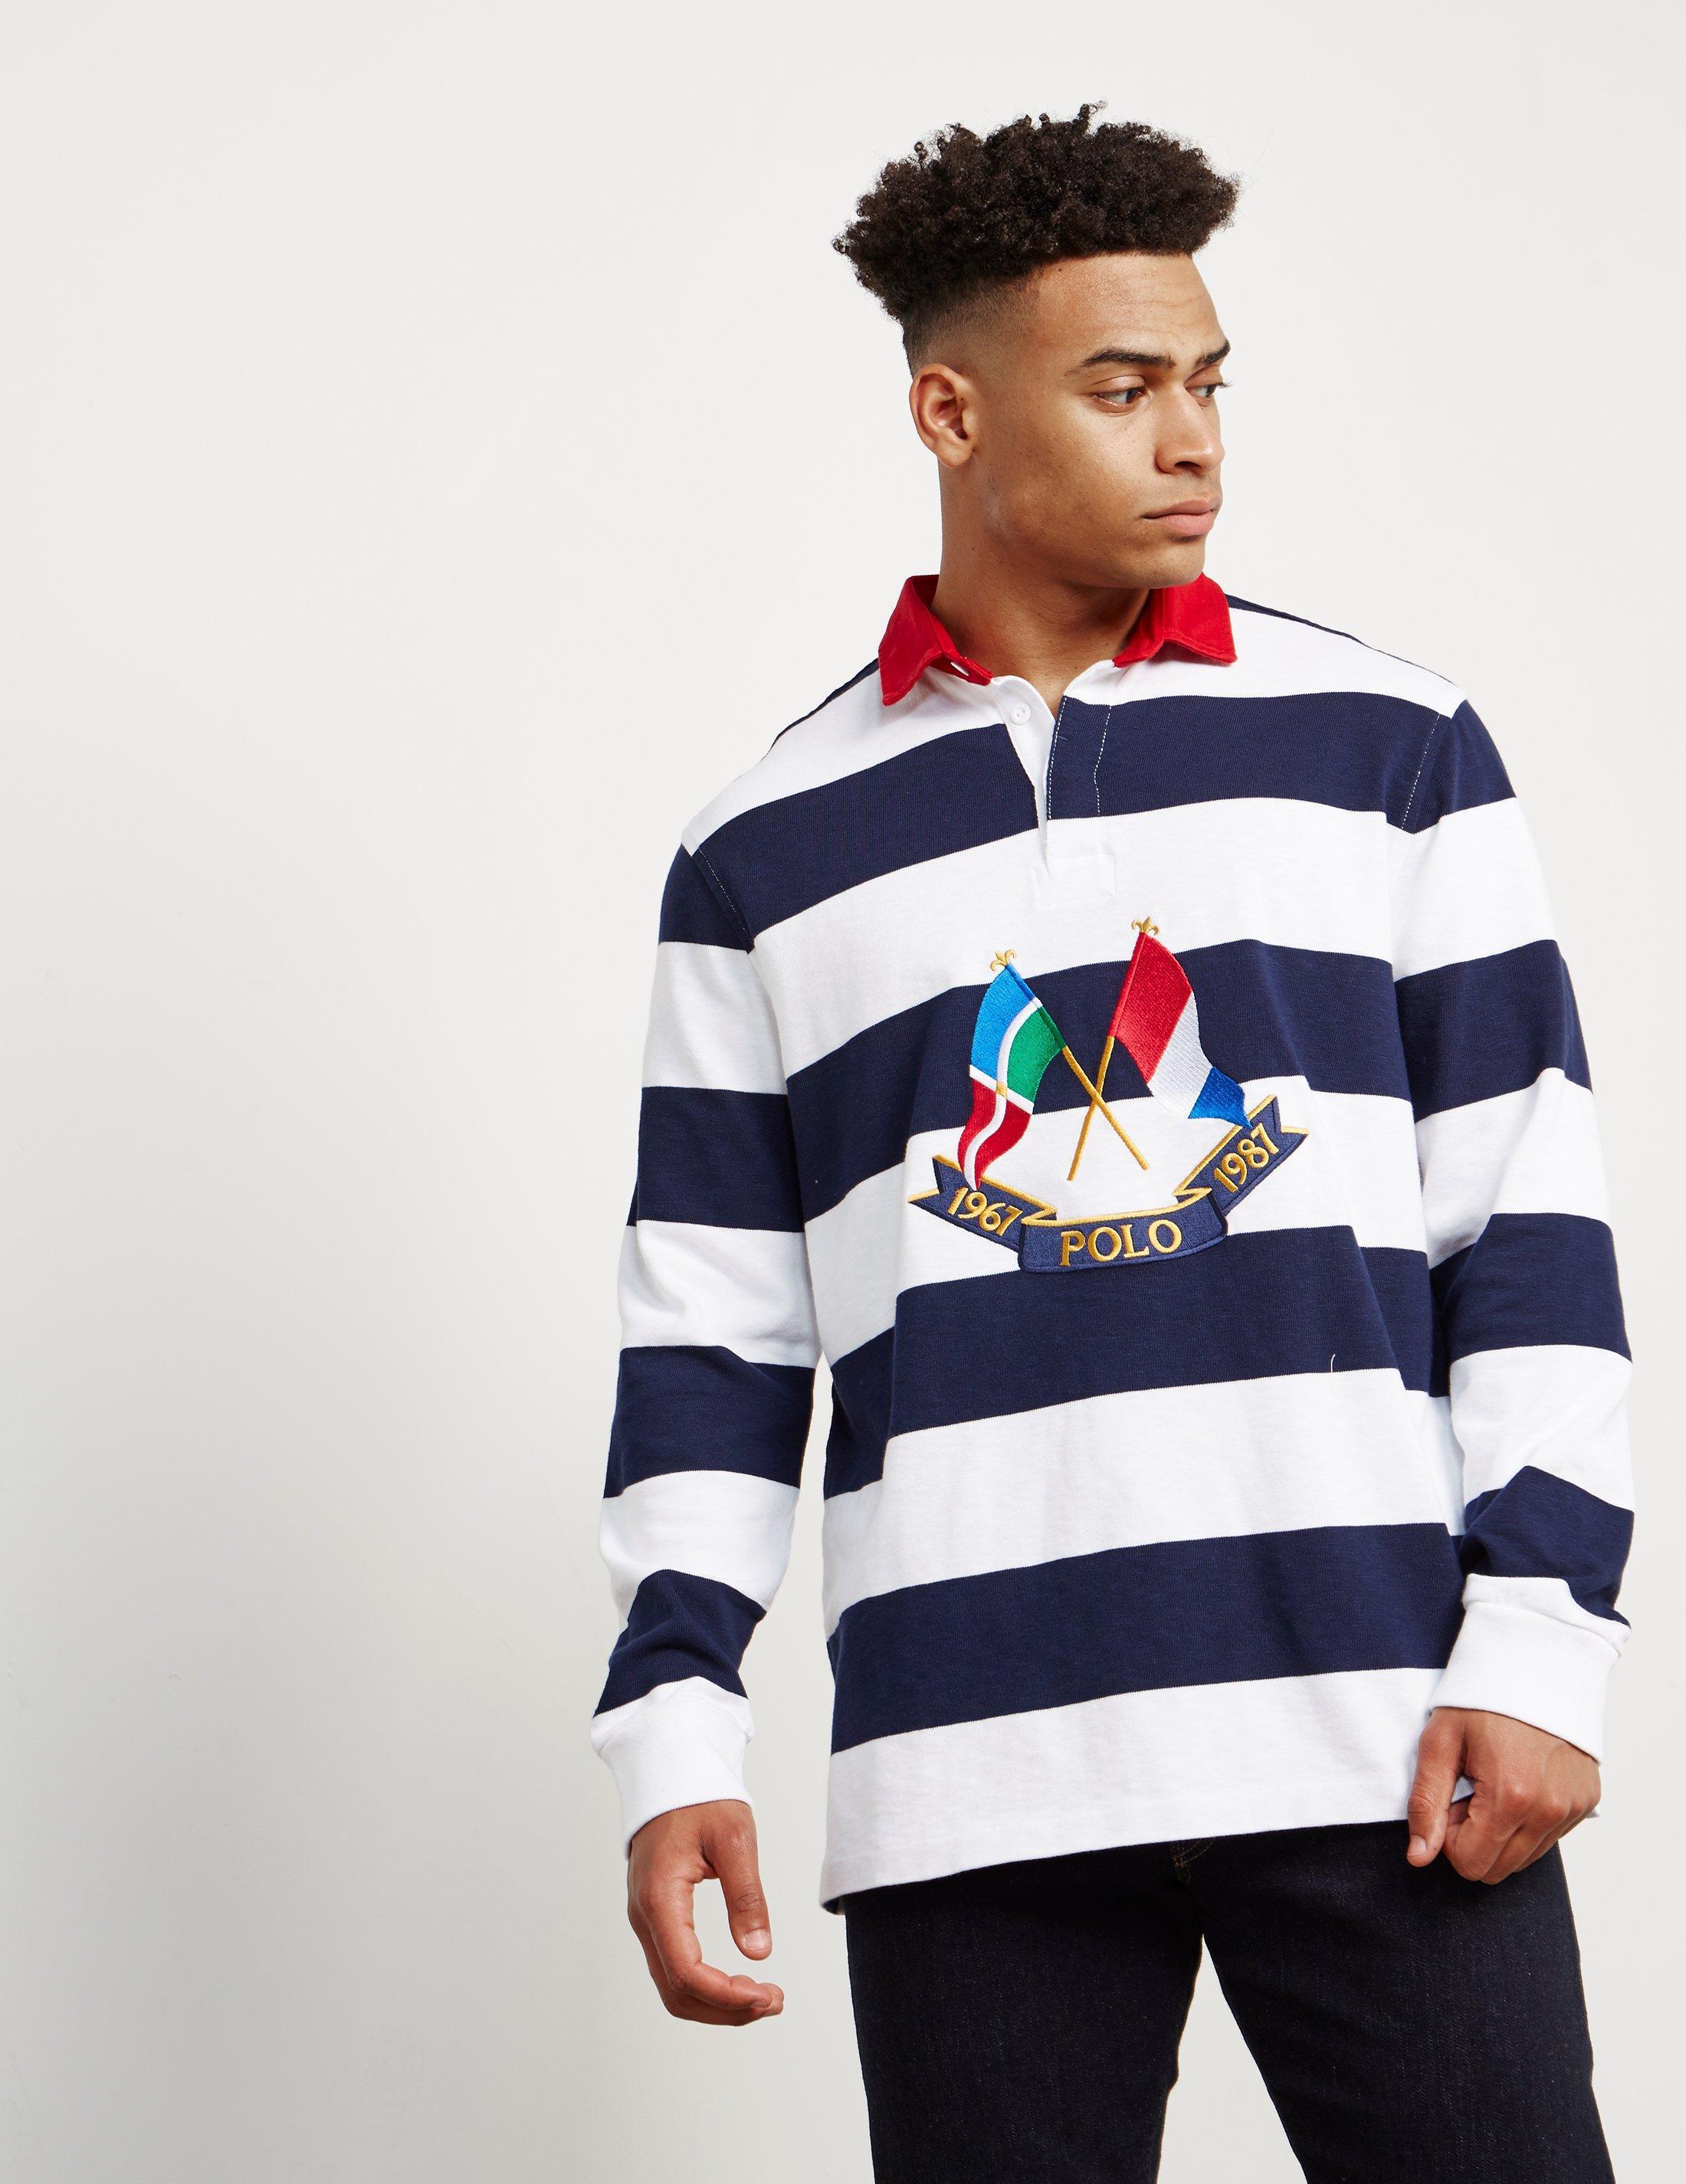 Long Sleeve Ralph Lauren Polo Shirts On Sale Rldm